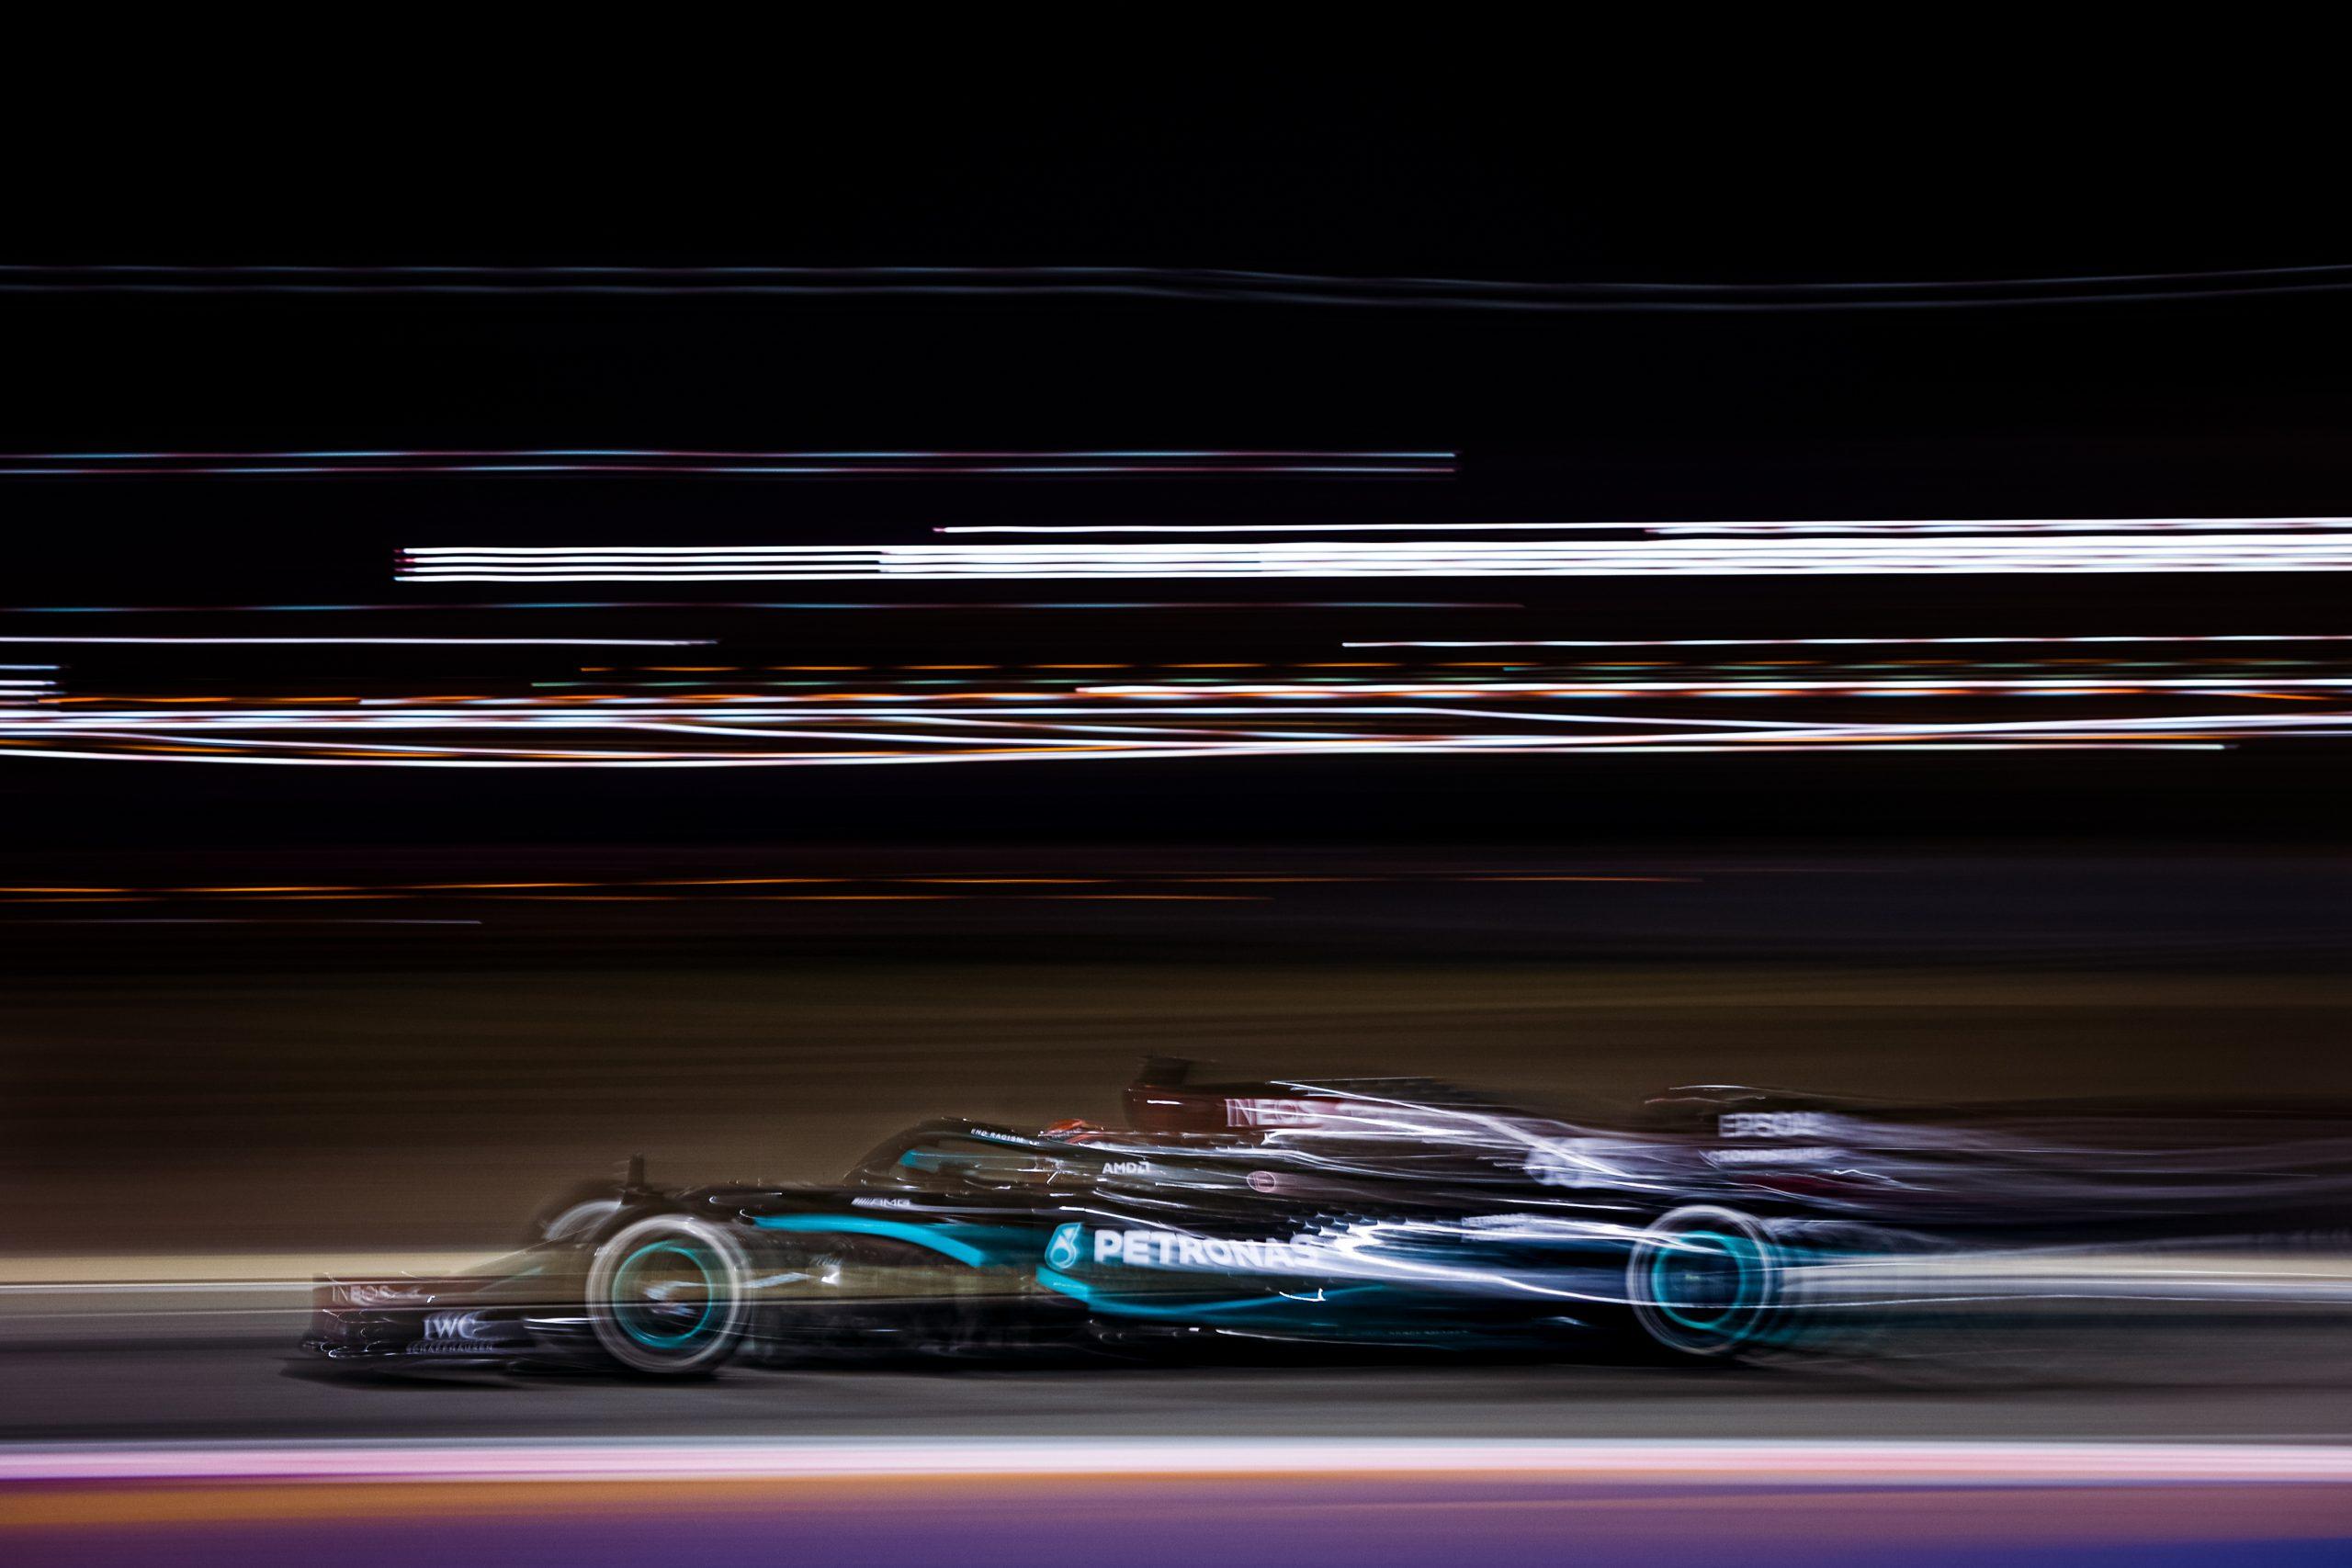 F1 – SAKHIR GRAND PRIX 2020 – RACE